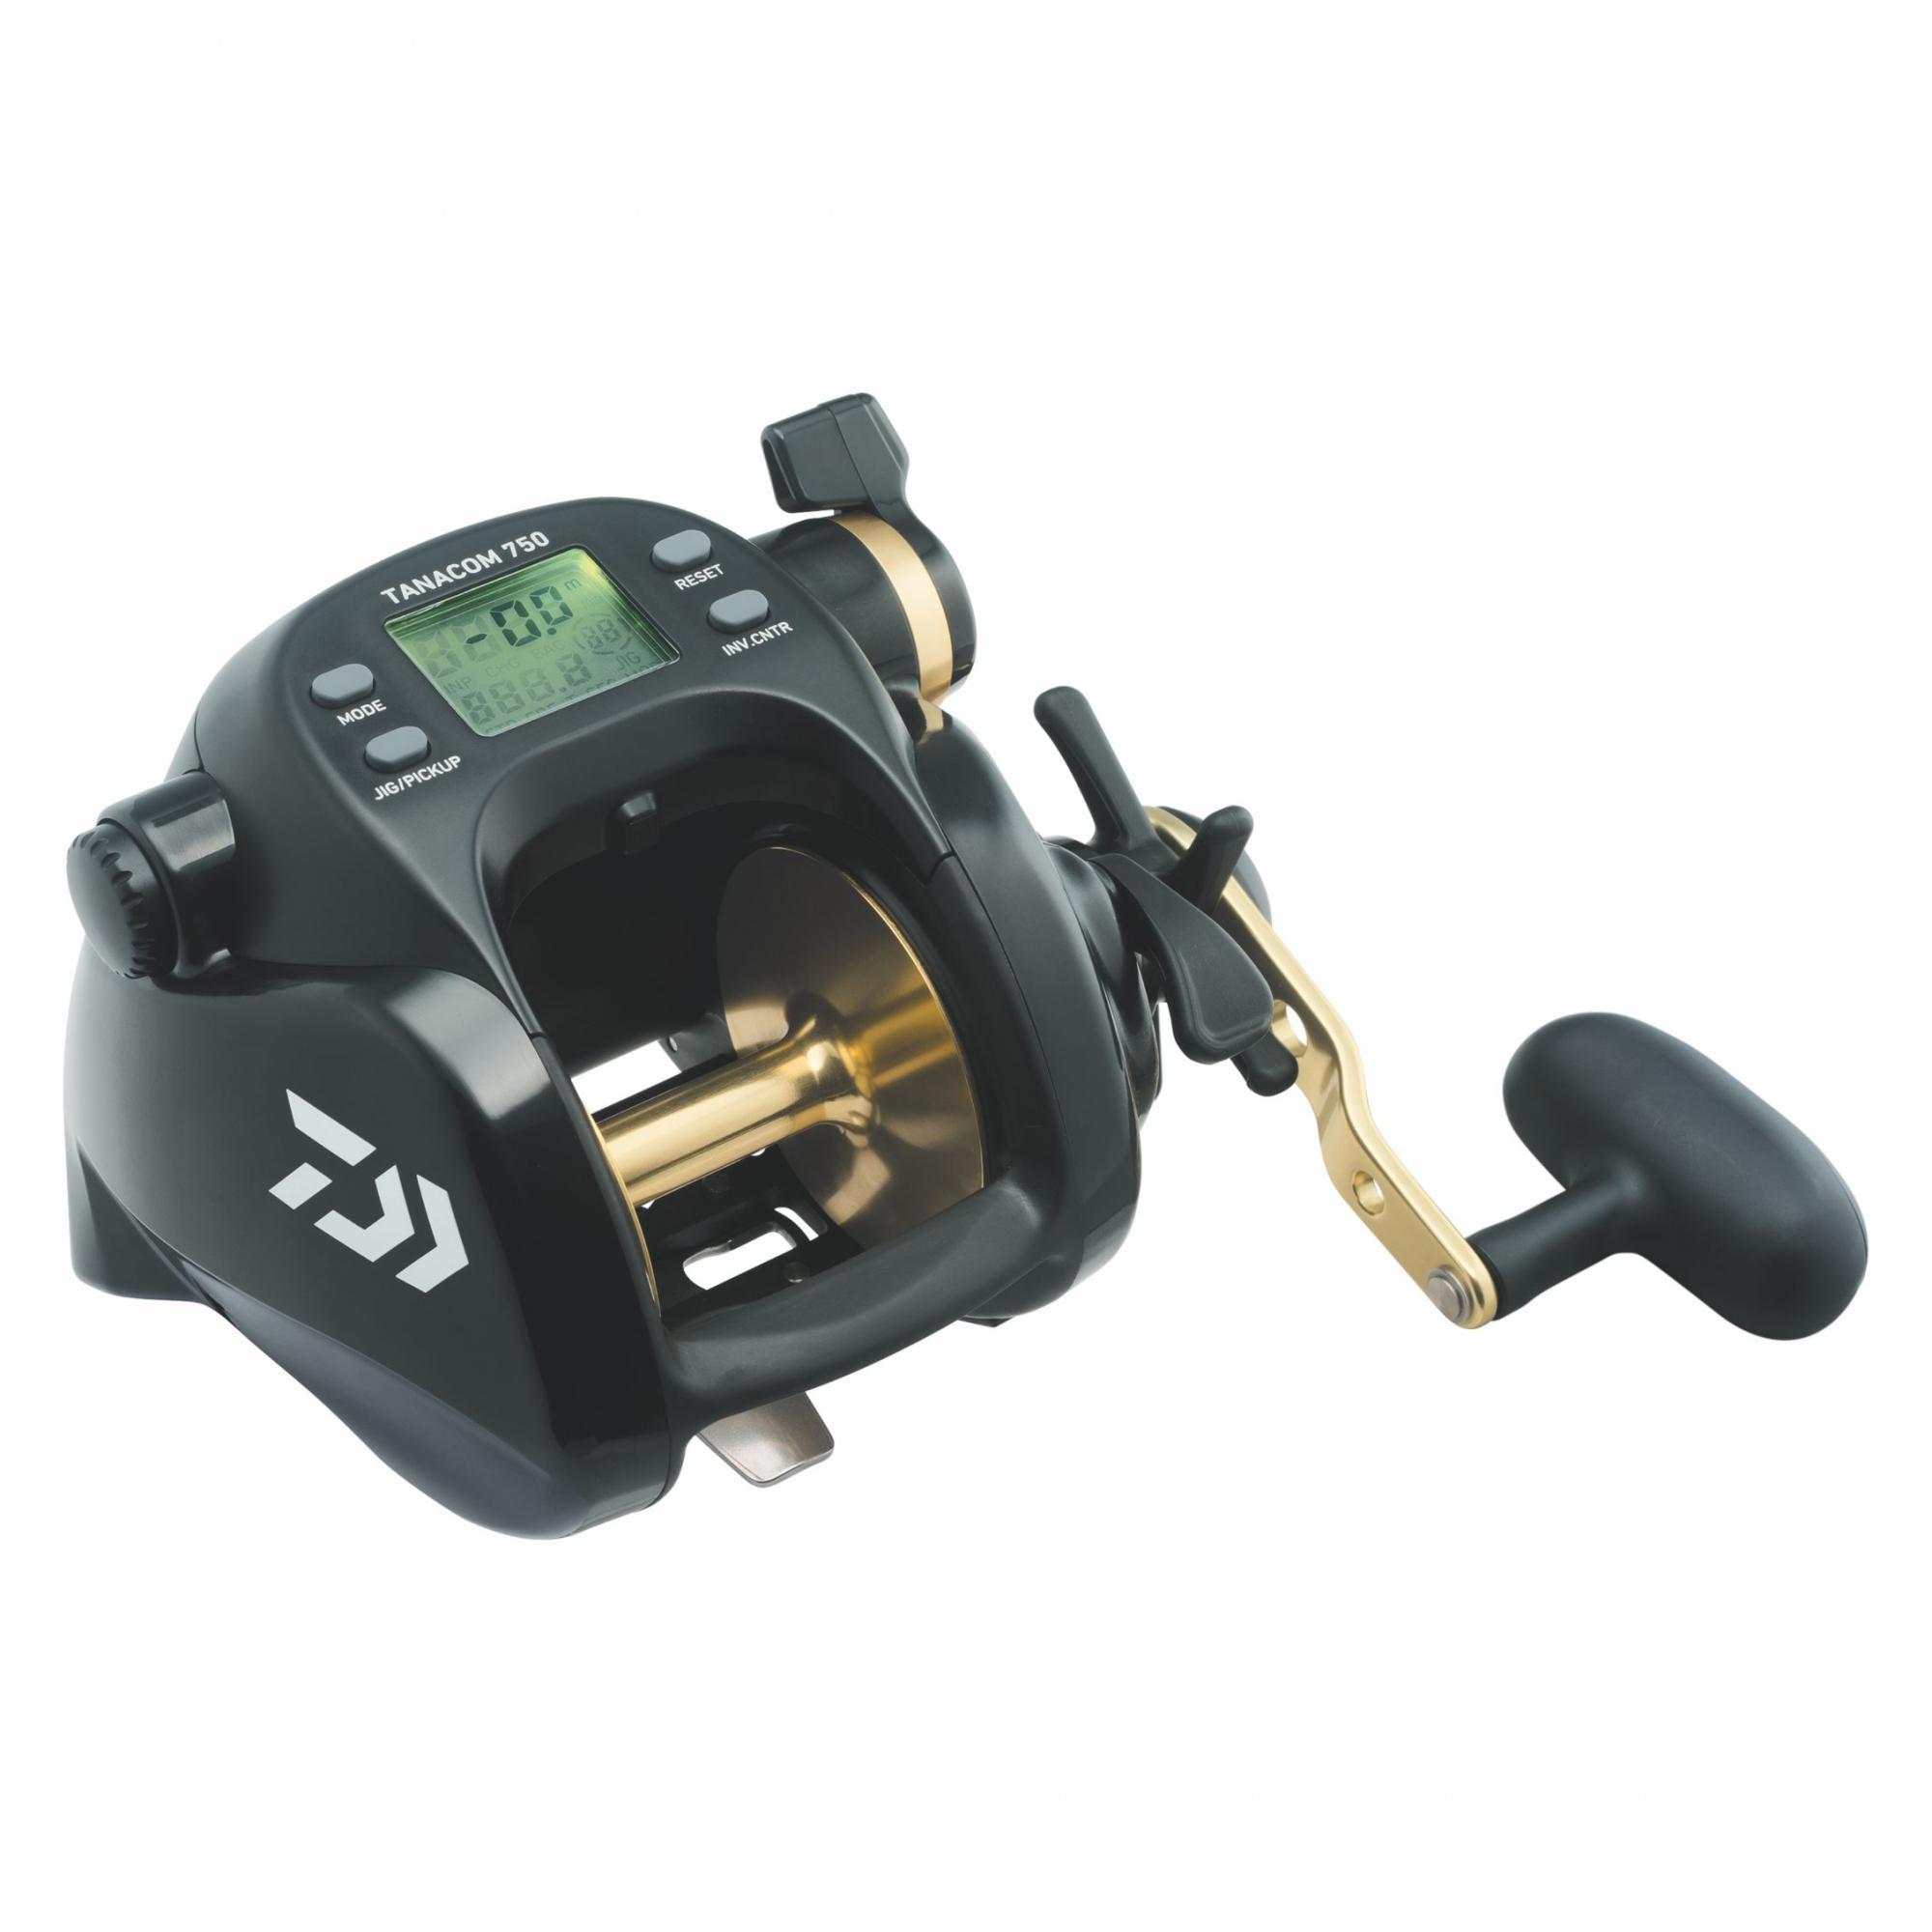 Carretilha Elétrica Daiwa Tanacom 750 Drag 22 kg  - Pesca Adventure